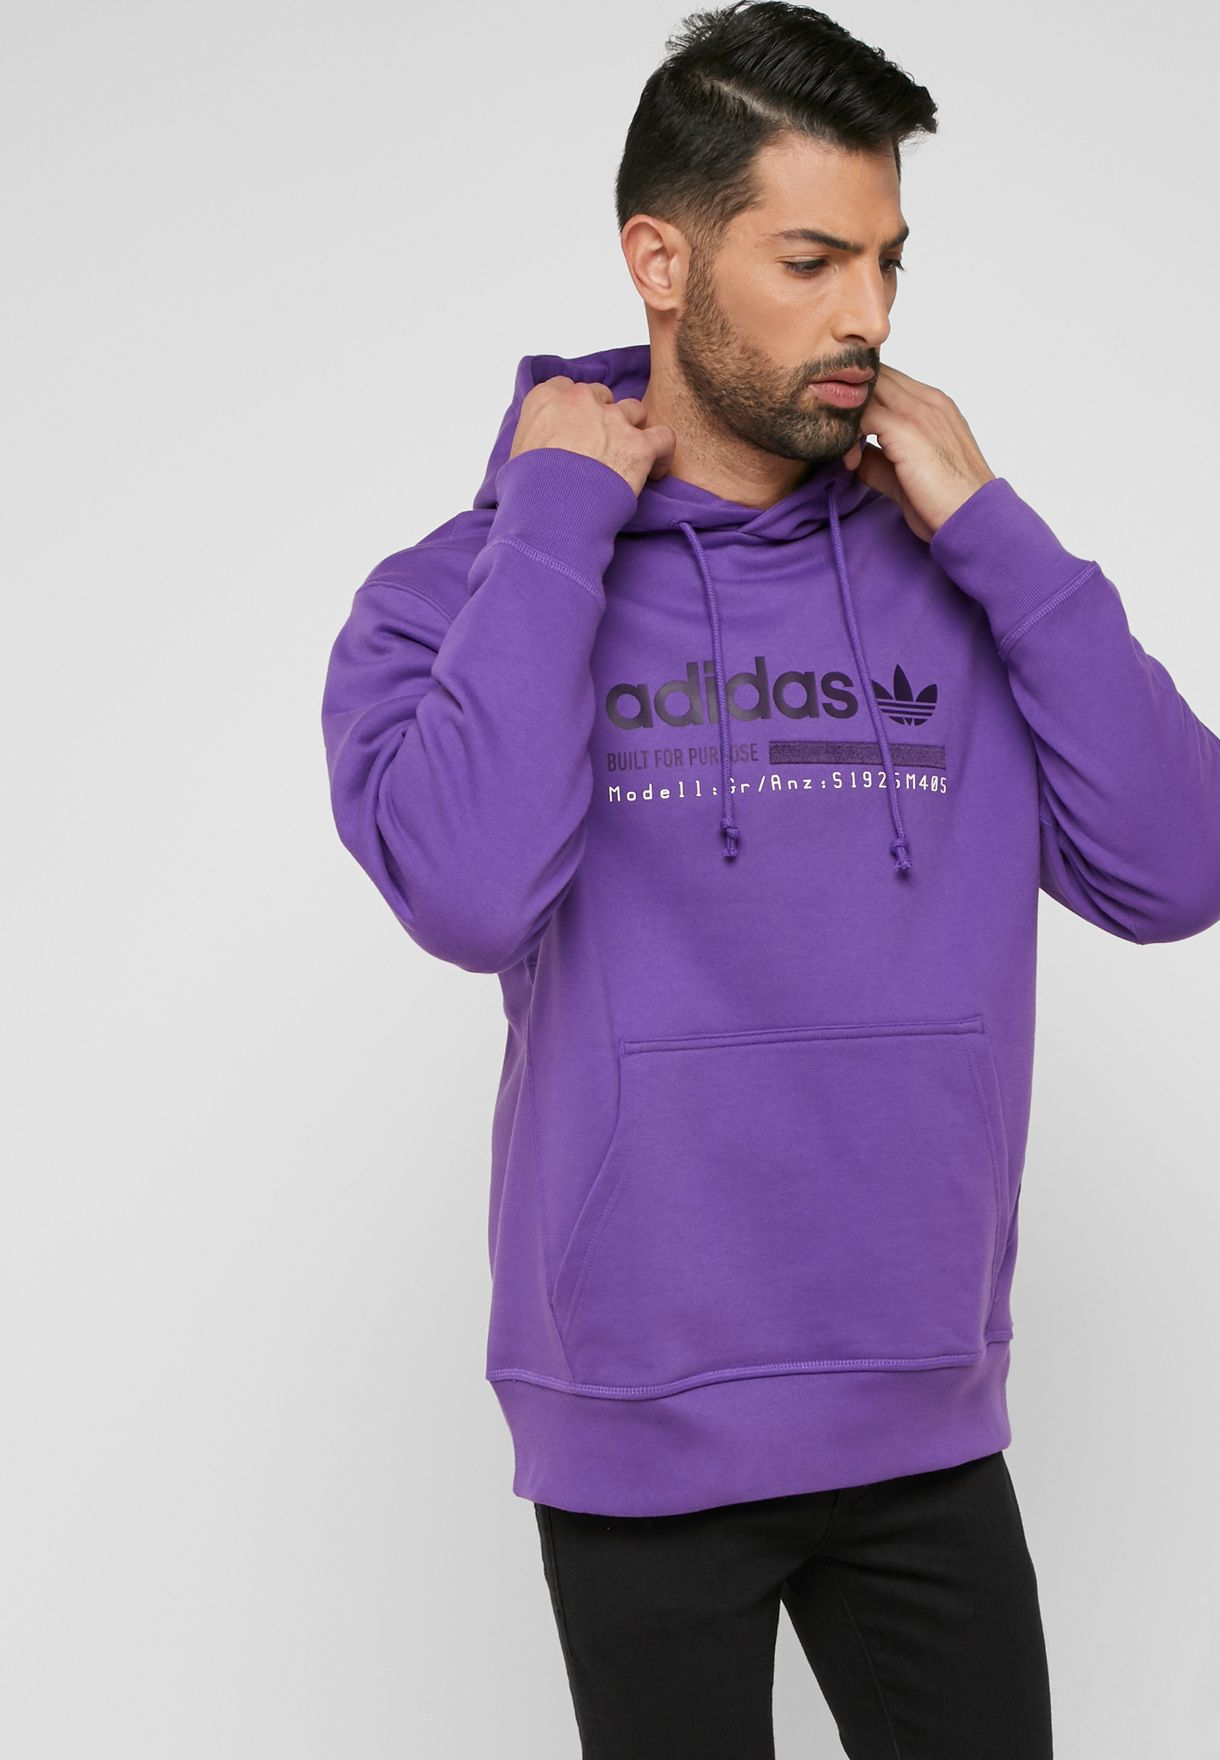 adidas Originals Men's Kaval Graphic Hoodie